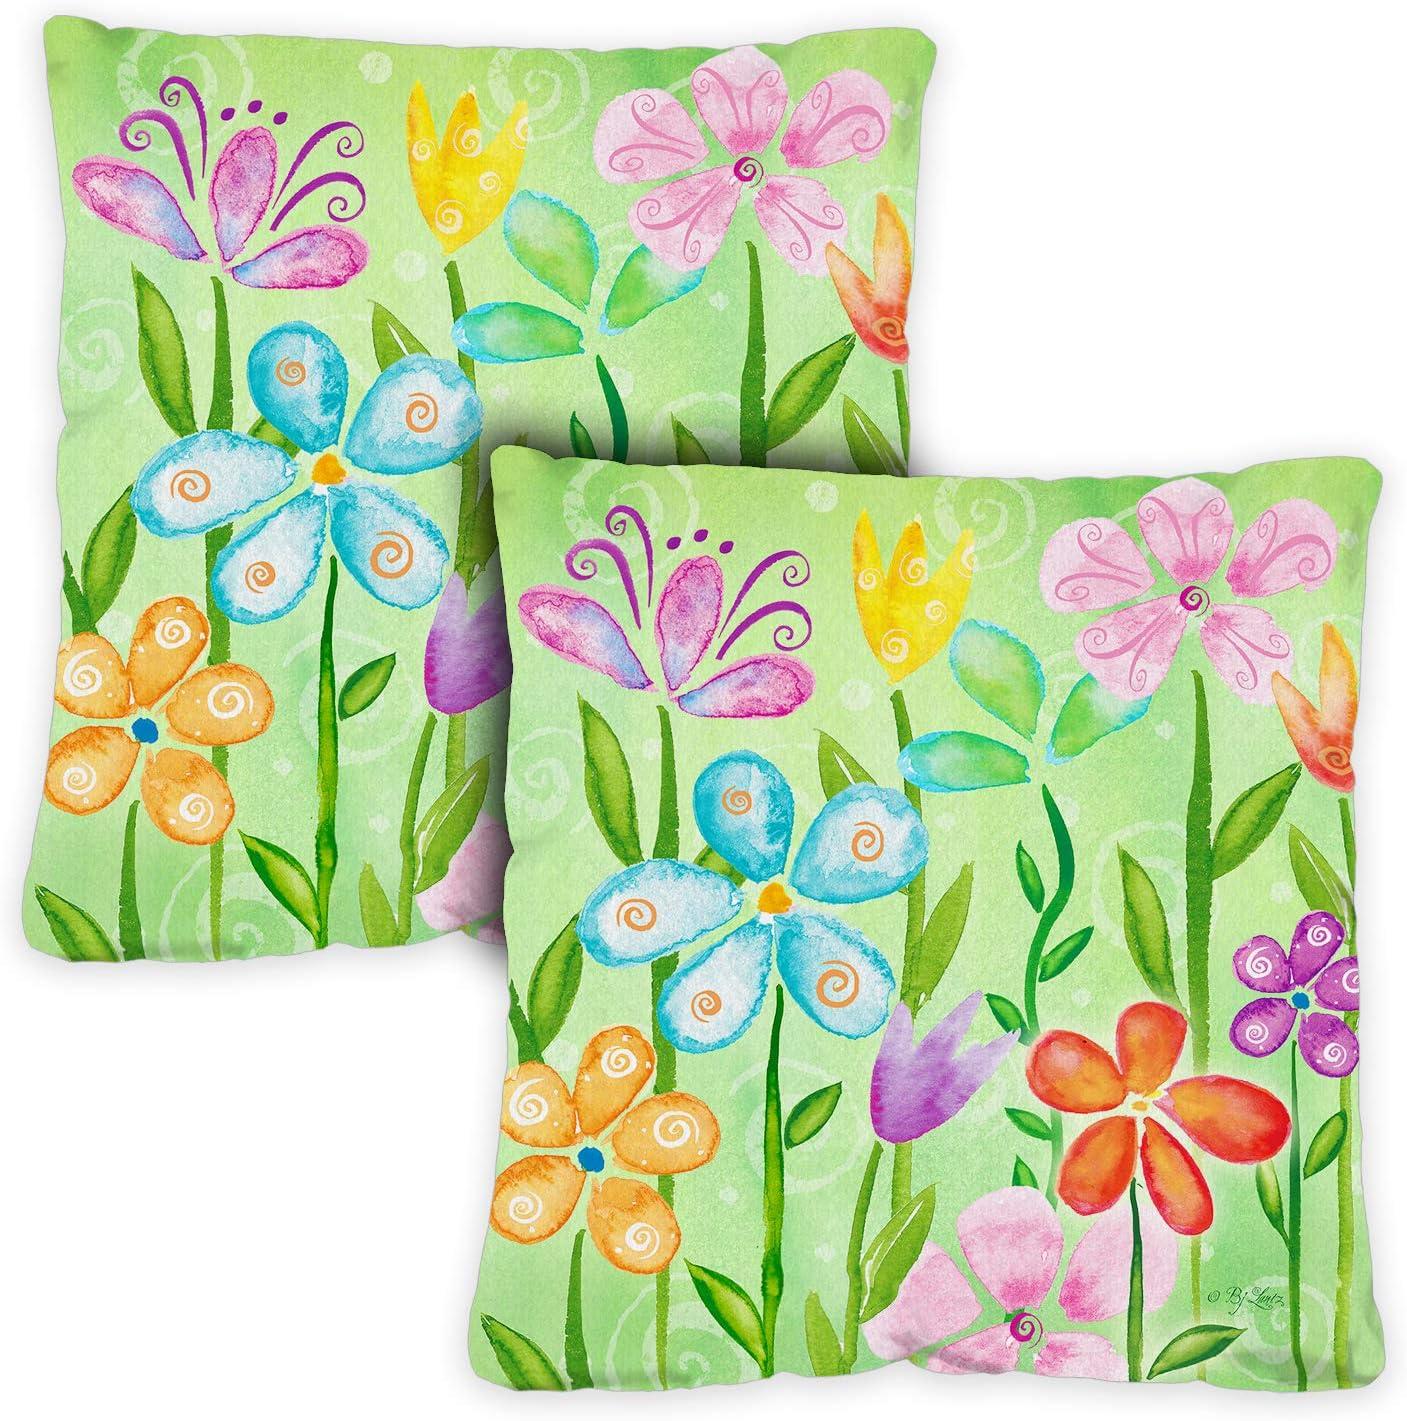 Toland Home Garden 761201 Spring Blooms 18 x 18 Inch Indoor/Outdoor, Pillow Case (2-Pack)